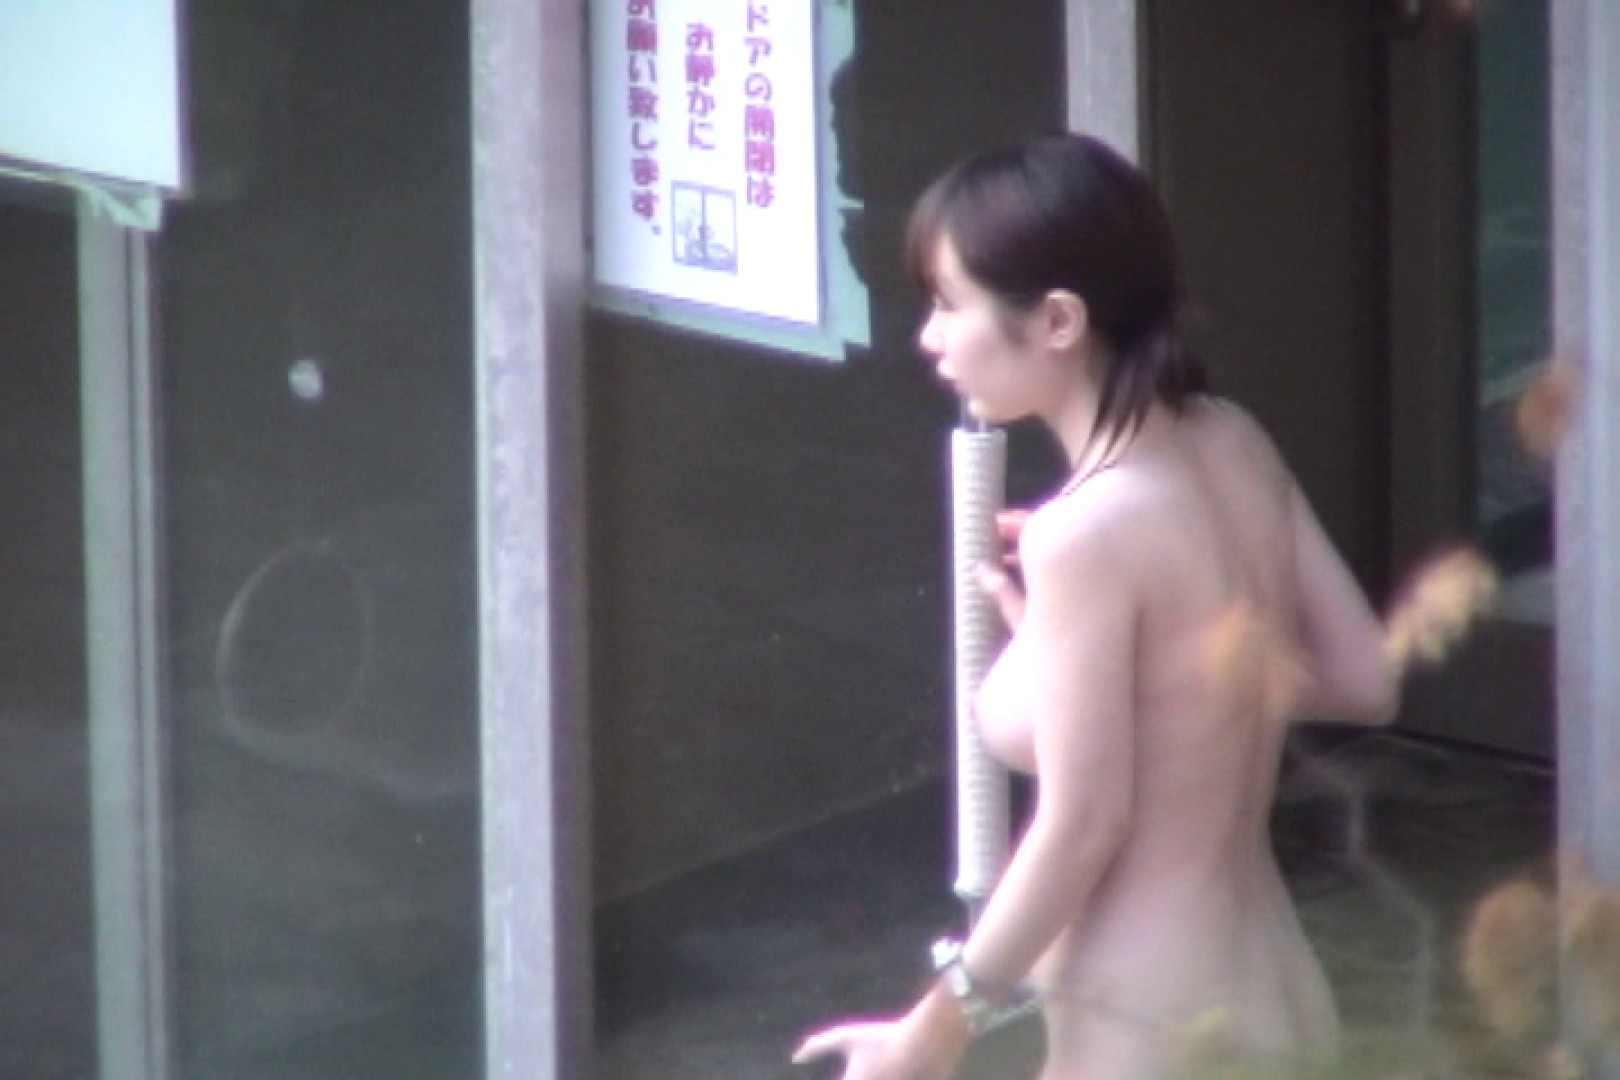 Aquaな露天風呂Vol.700 盗撮シリーズ | 露天風呂編  97PIX 11